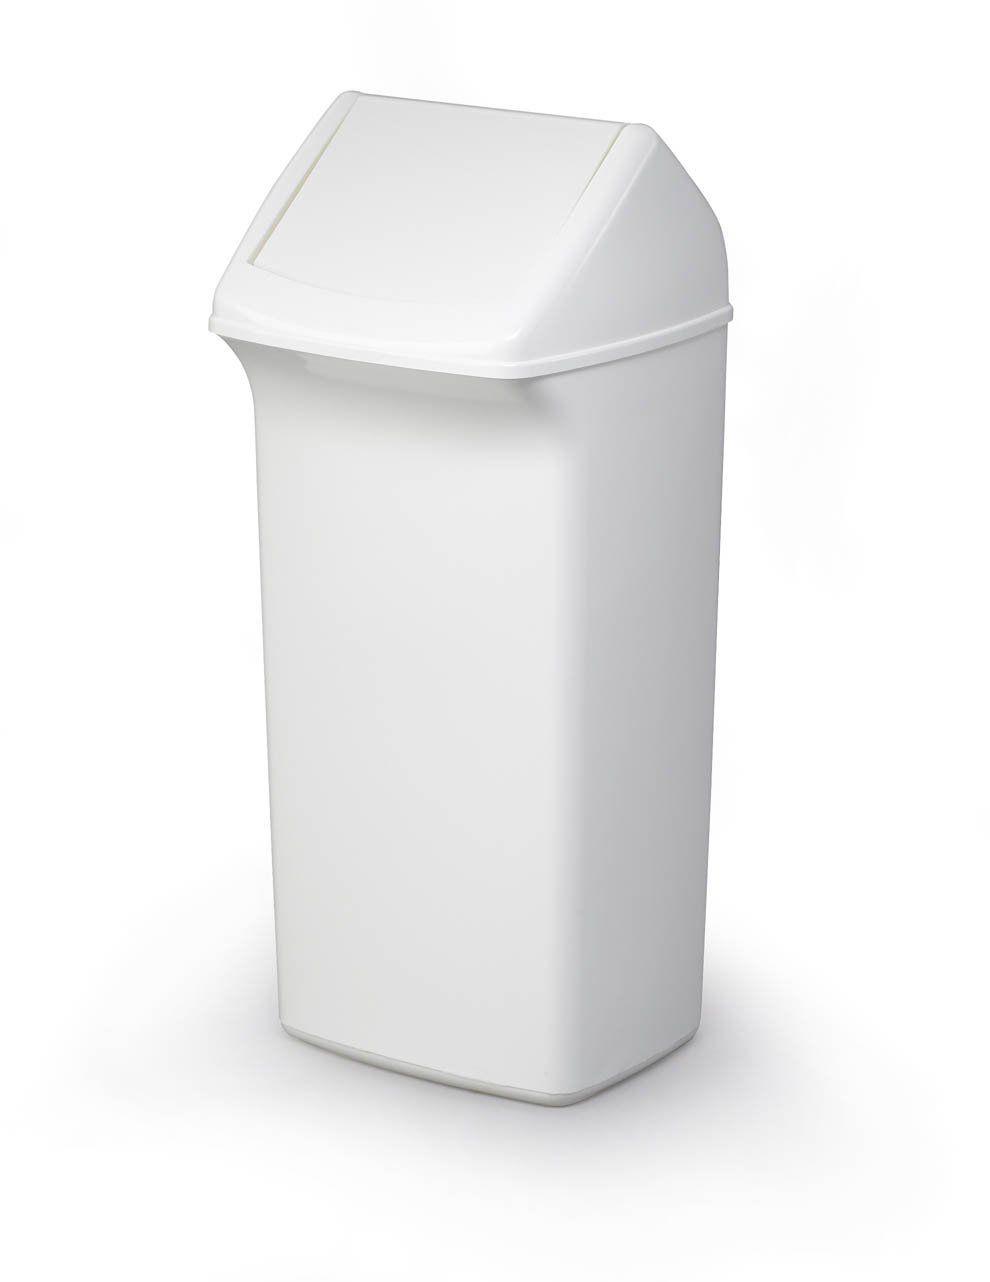 Odpadkový koš, Výkl. Poklop, DURABIN SQUARE 40 - Bílý